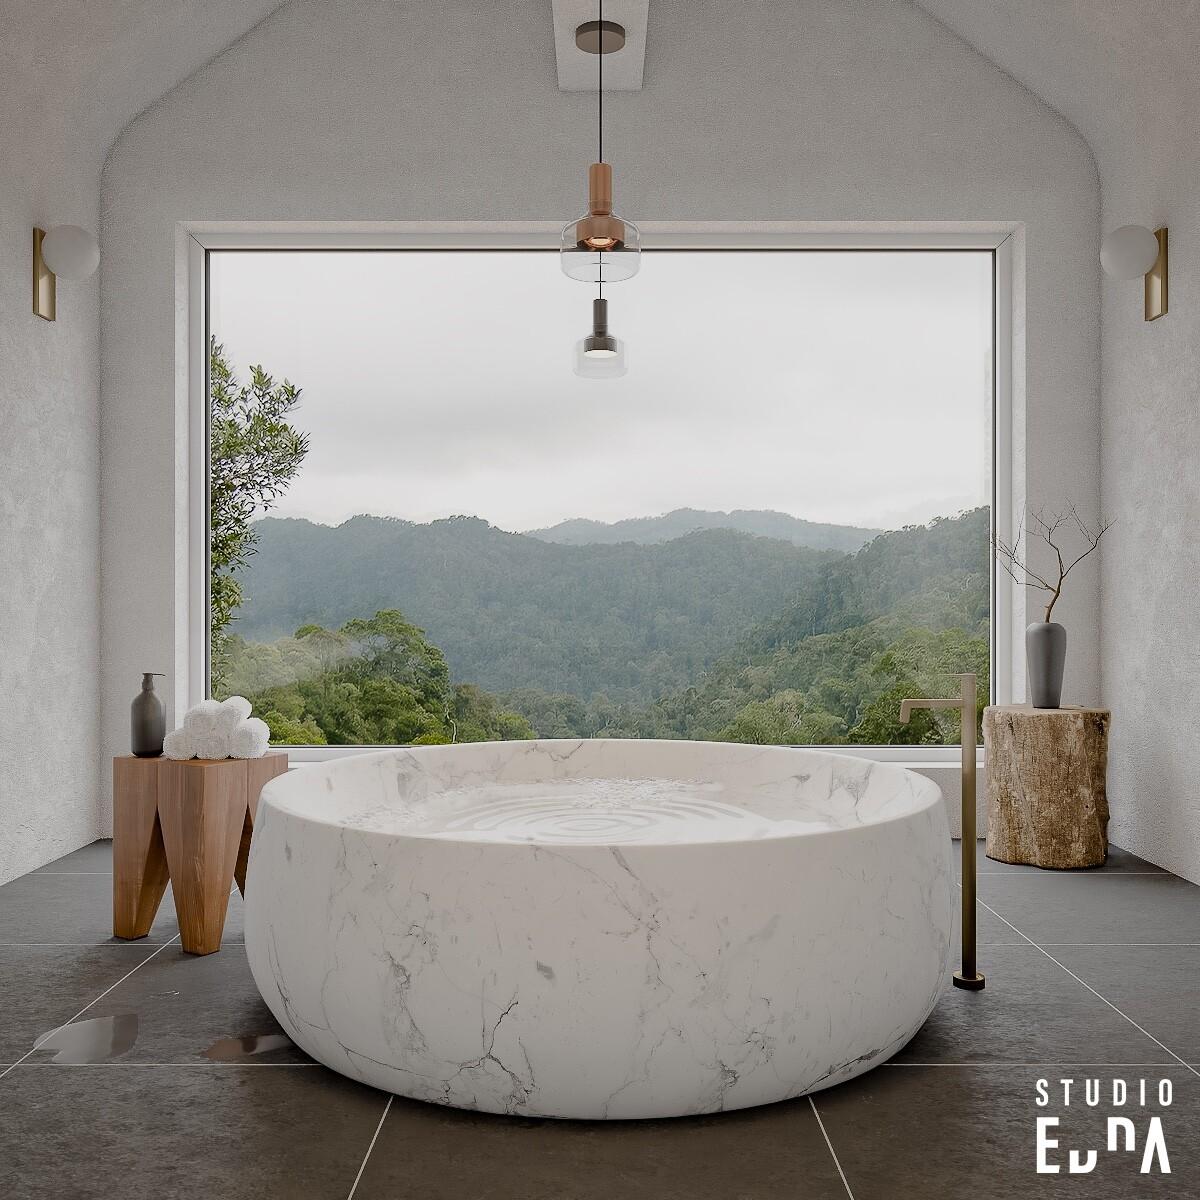 CG - Bathroom - Studio Edna 2nd view